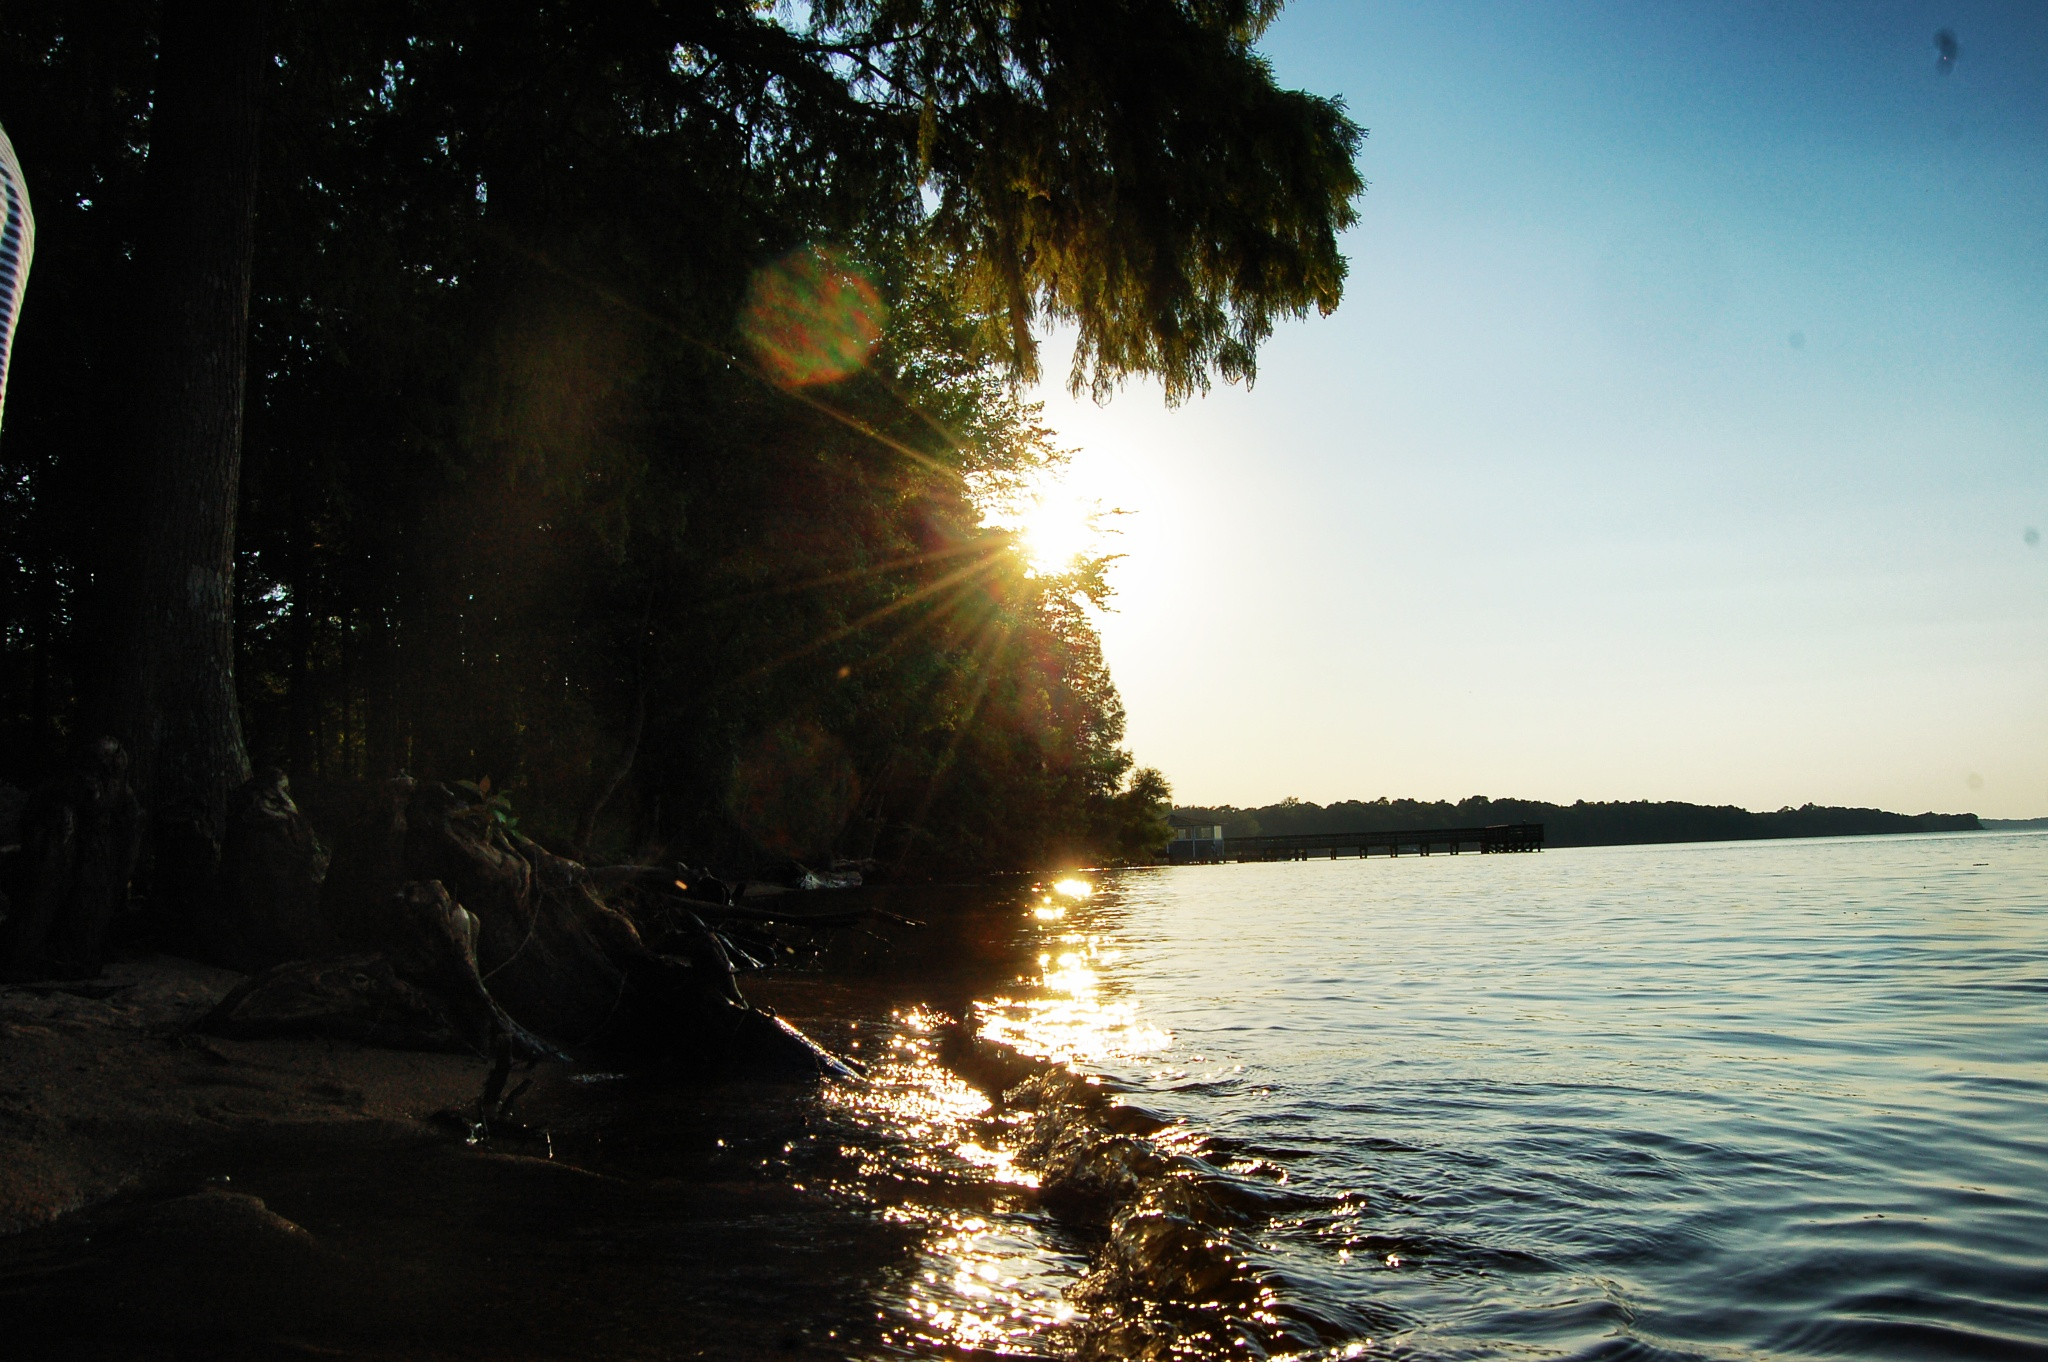 Lake Marion by Ben Maiden